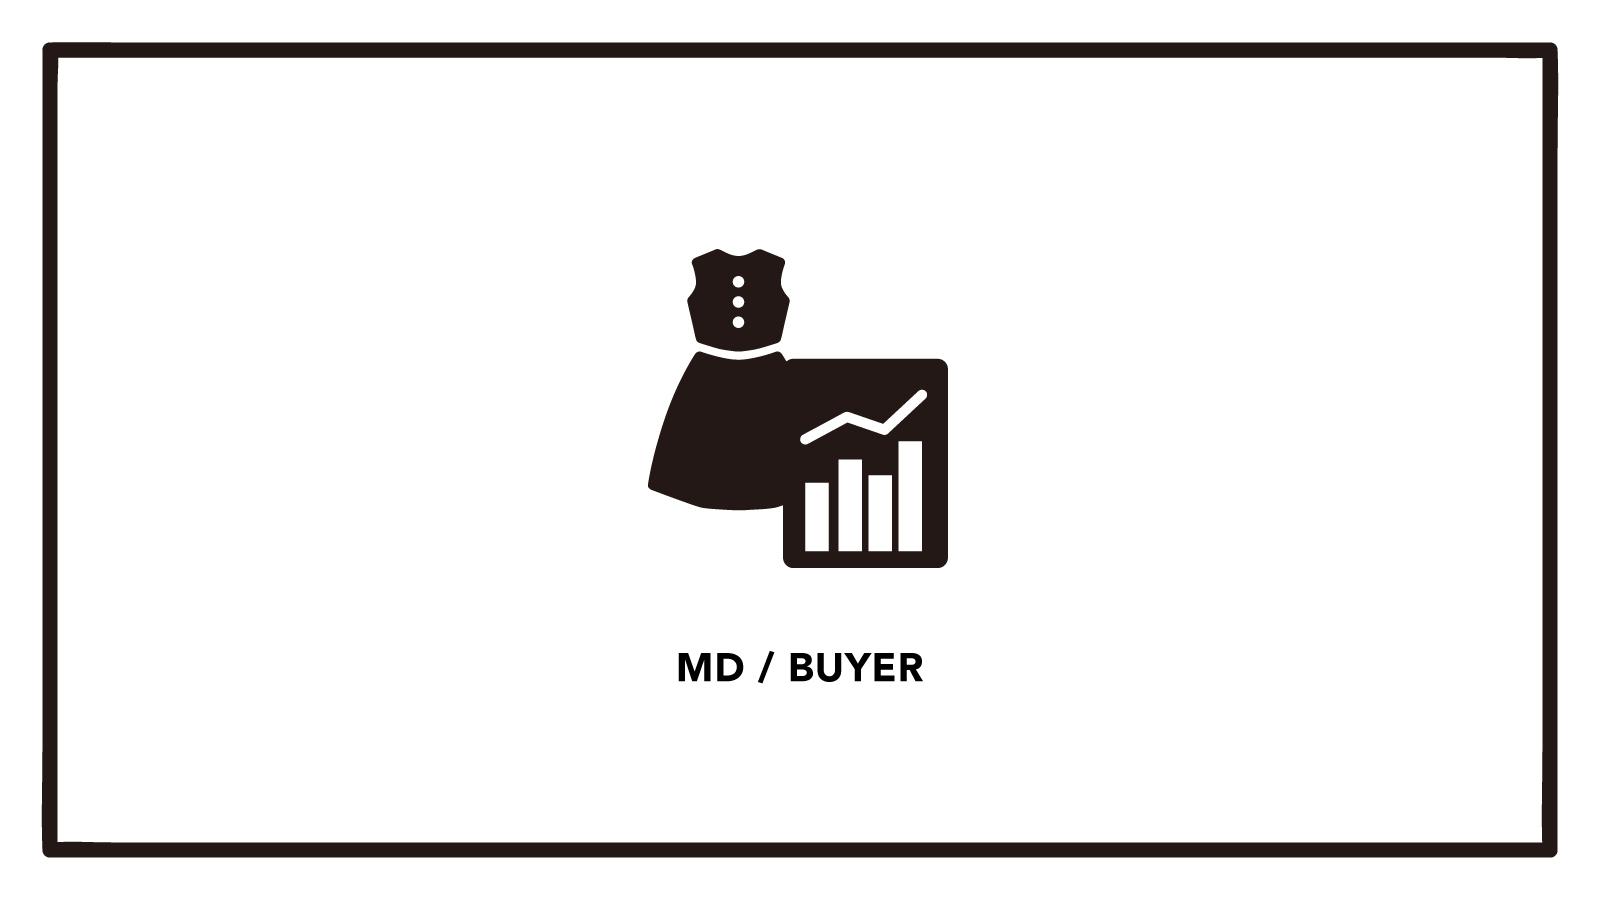 【MD】大手企業での募集|経験者募集のカバー写真